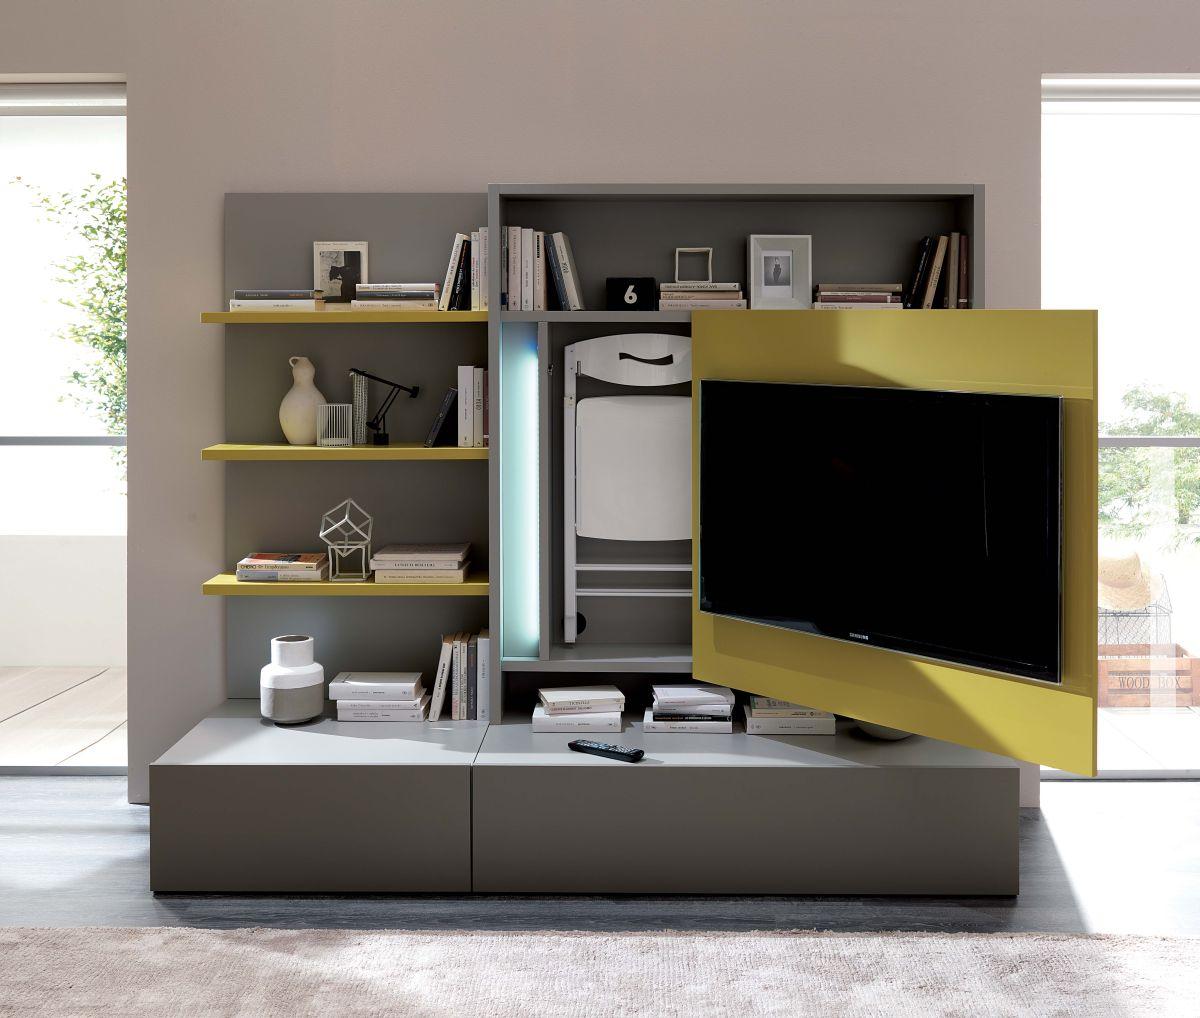 04go-modernozzio-smart-living-transformable-furniture.jpg